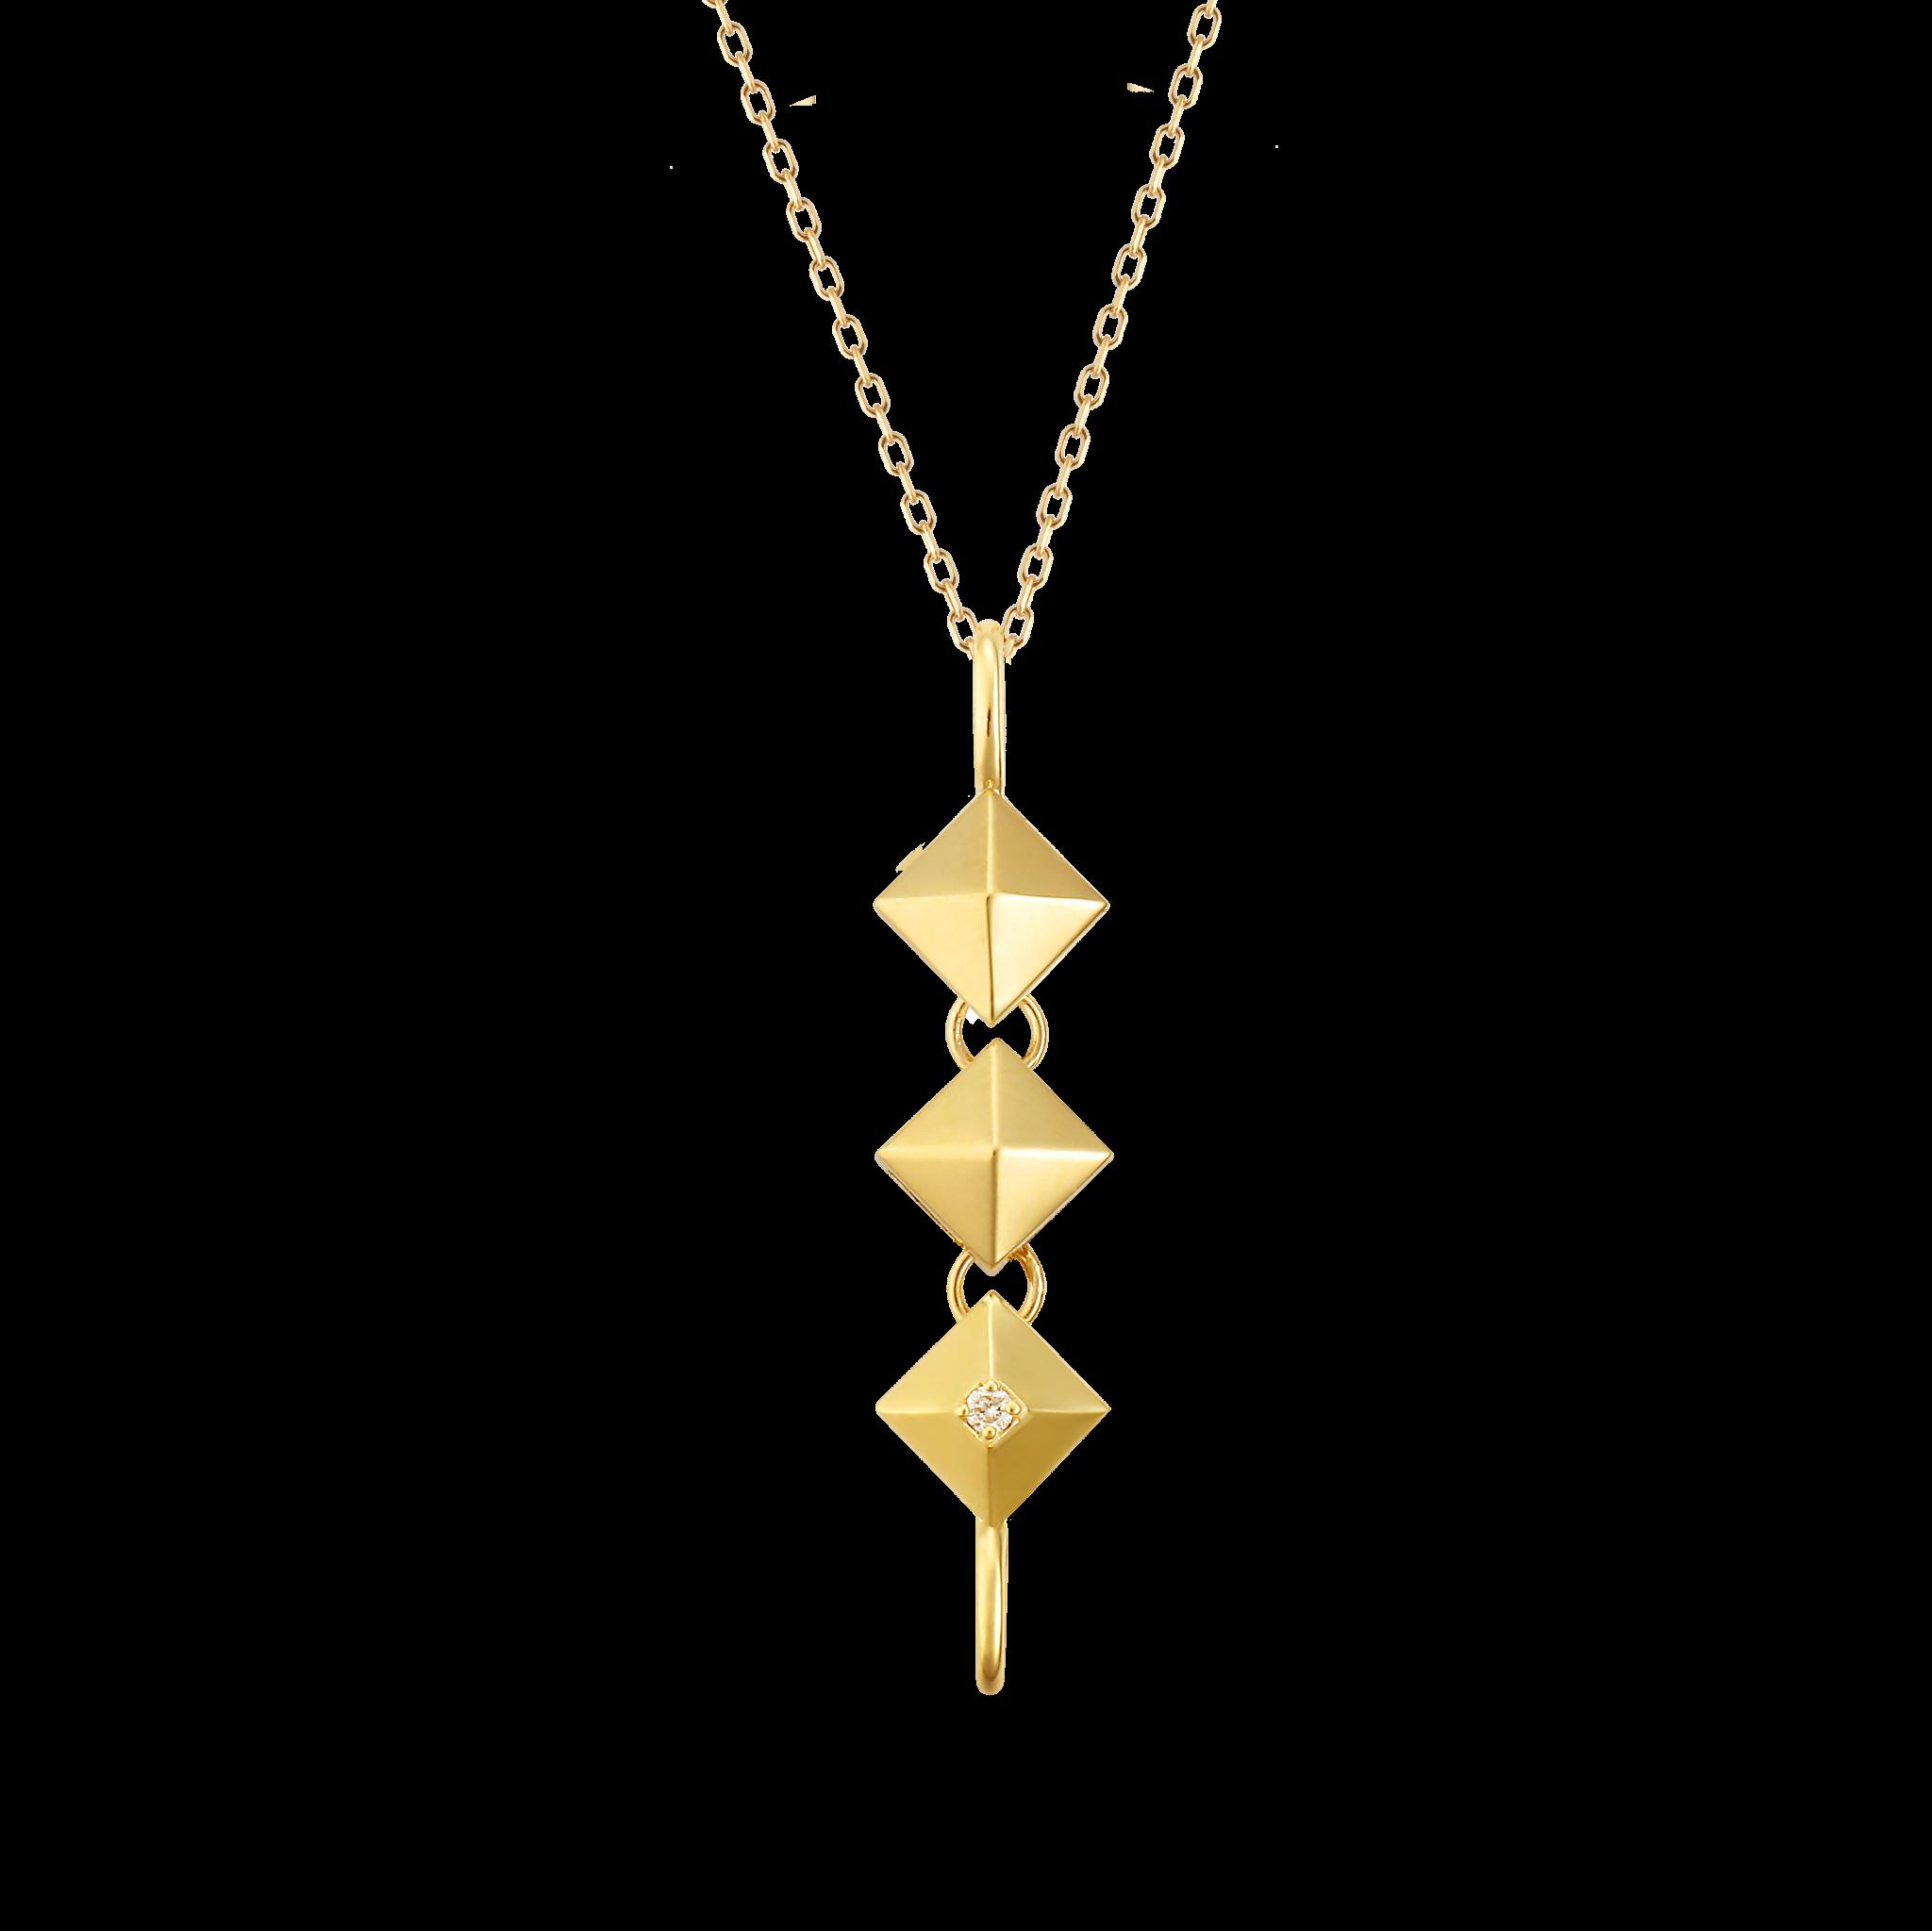 PYRAMIDAL Collection 18K黄金钻石项链 6699